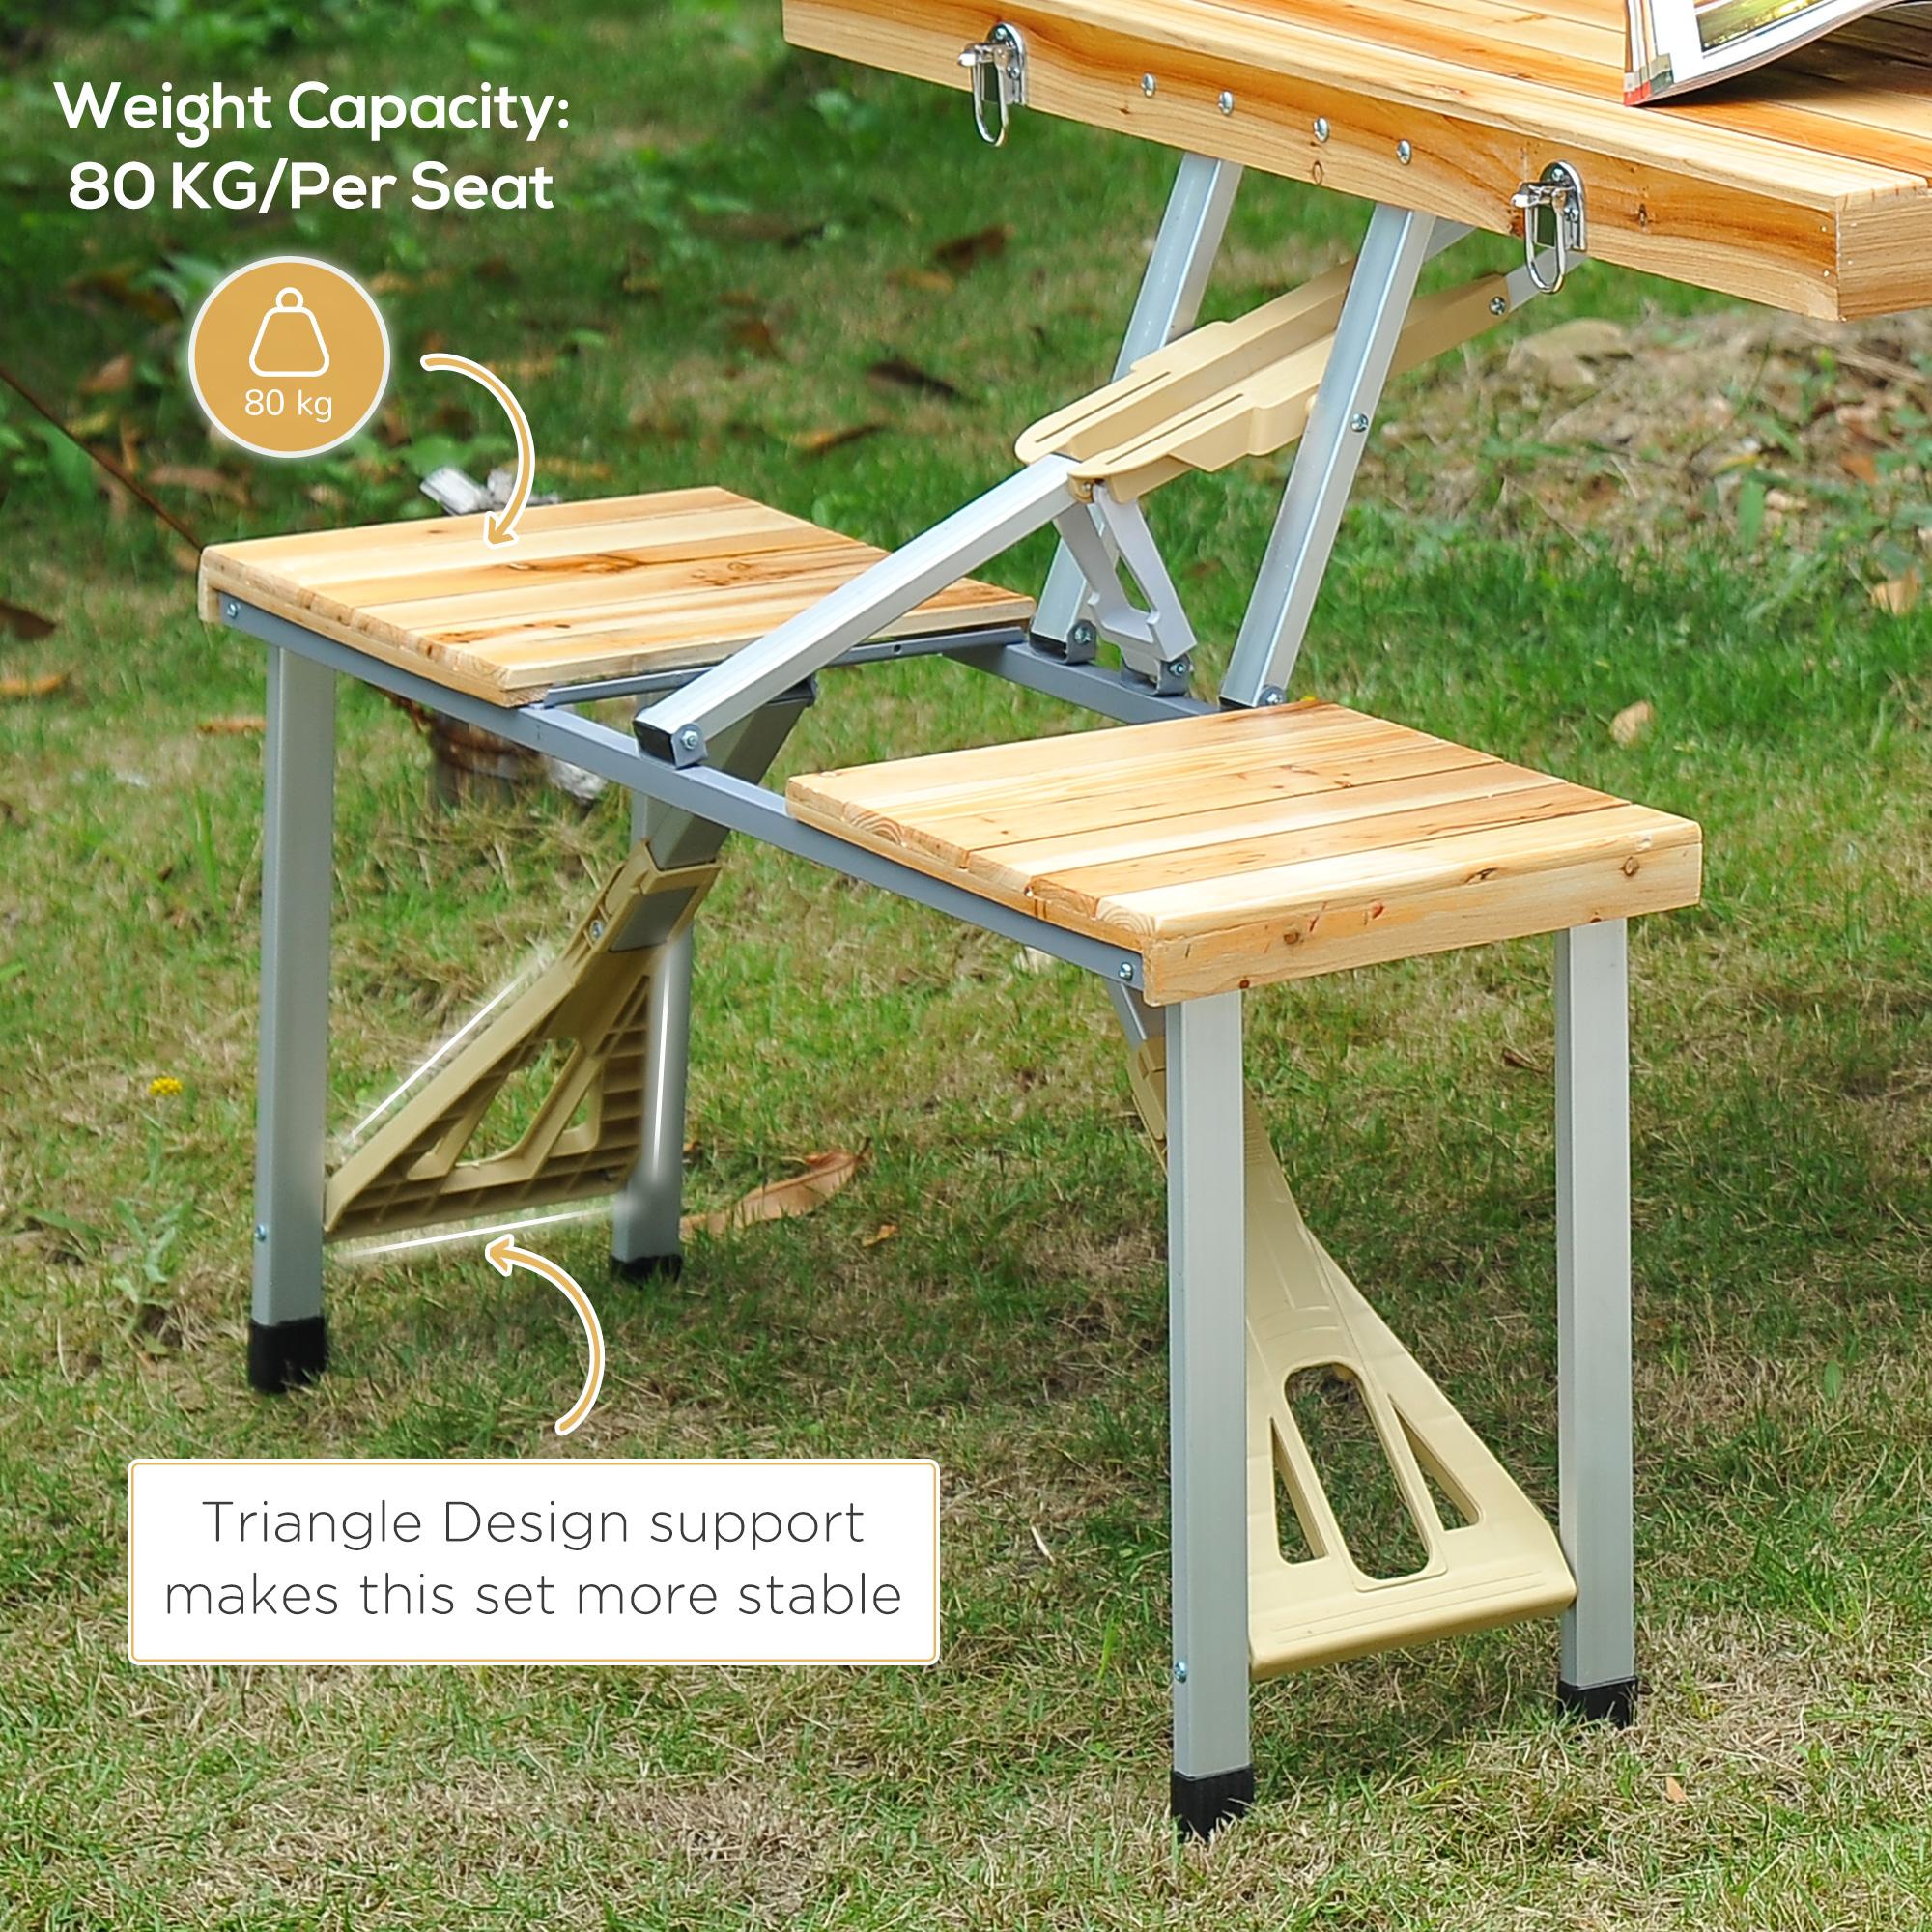 thumbnail 55 - Portable Folding Camping Picnic Table Party Outdoor Garden Chair Stools Set